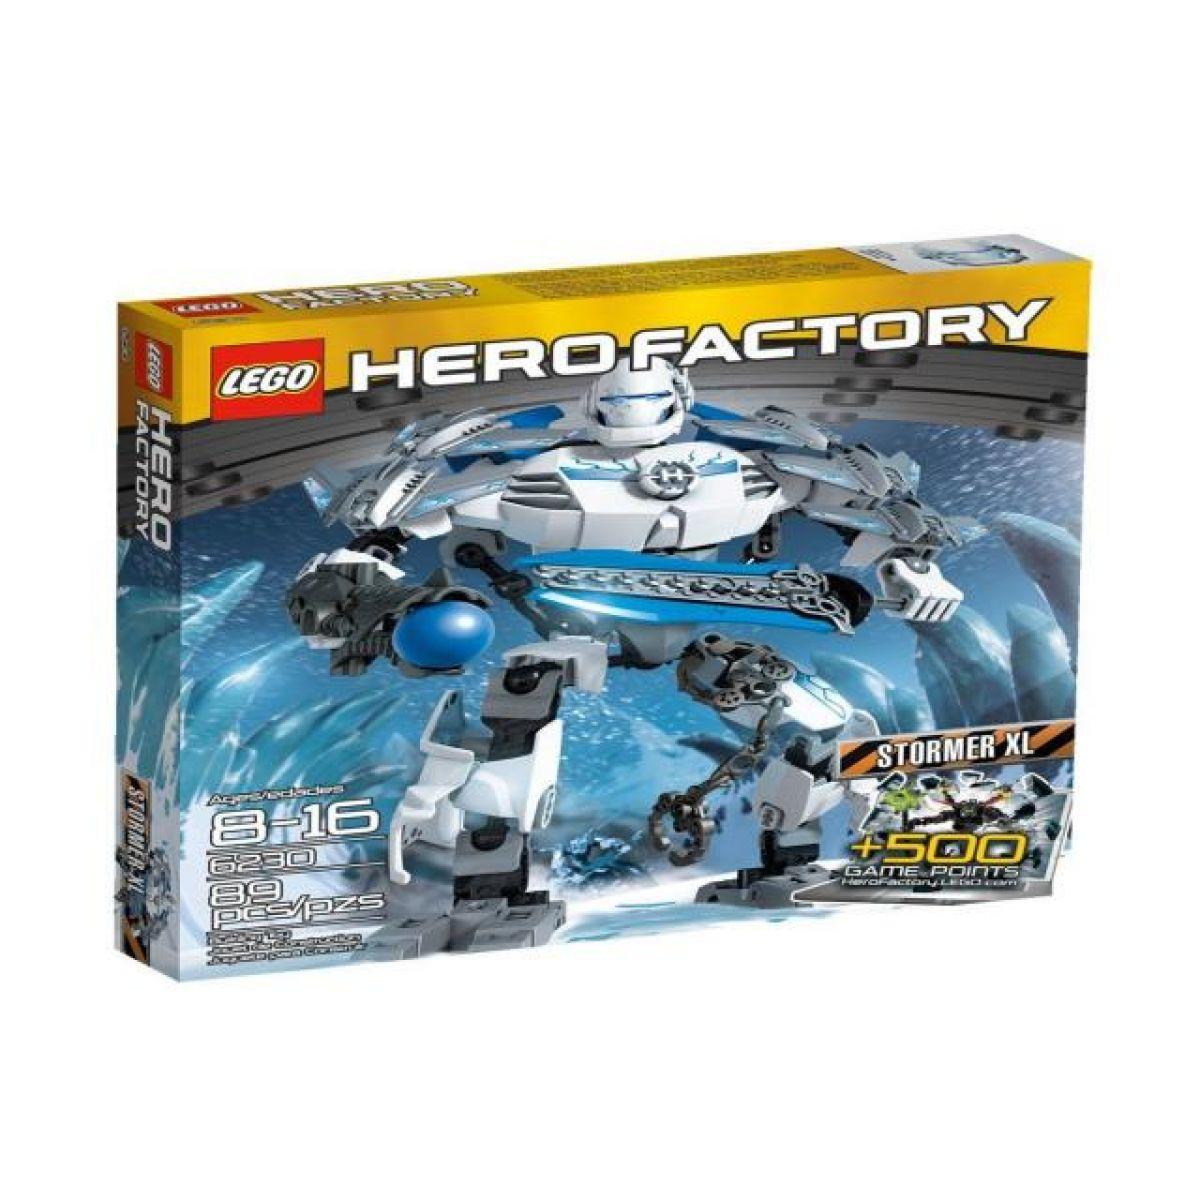 LEGO 6230 Hero Factory Stormer XL